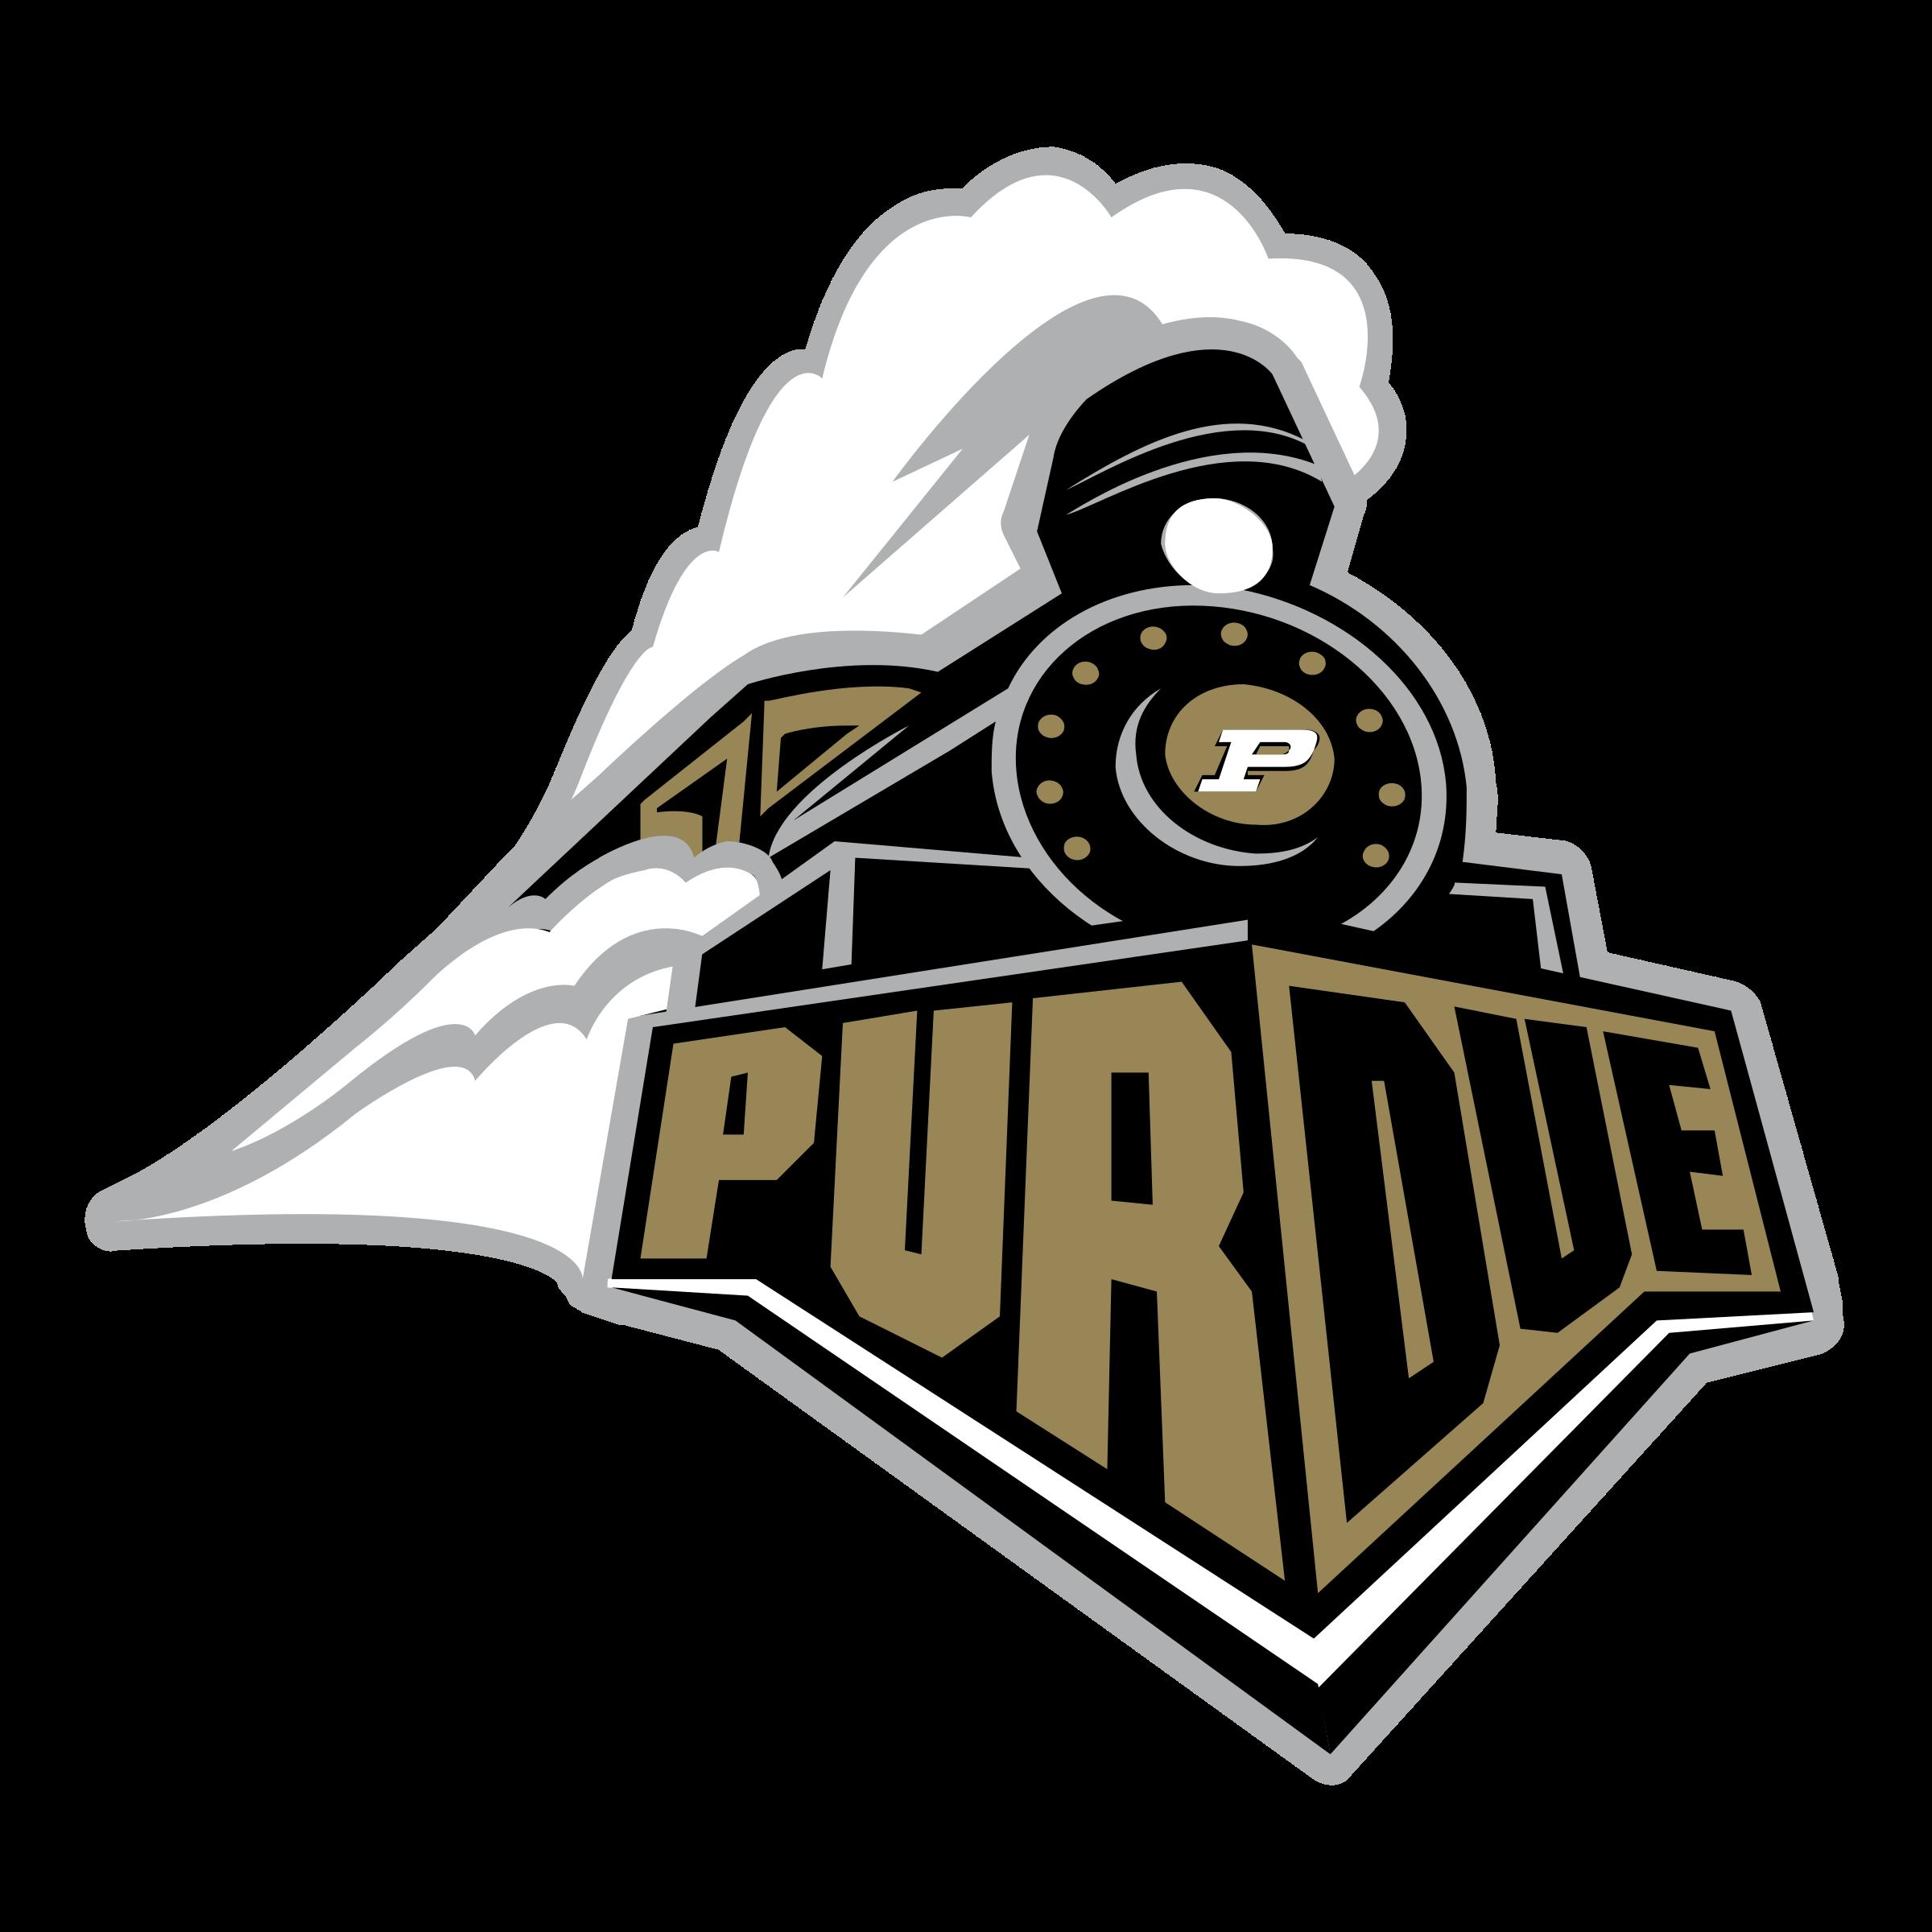 purdue university boilermakers logo png transparent svg vector rh freebiesupply com purdue university logo vector purdue university logo vector